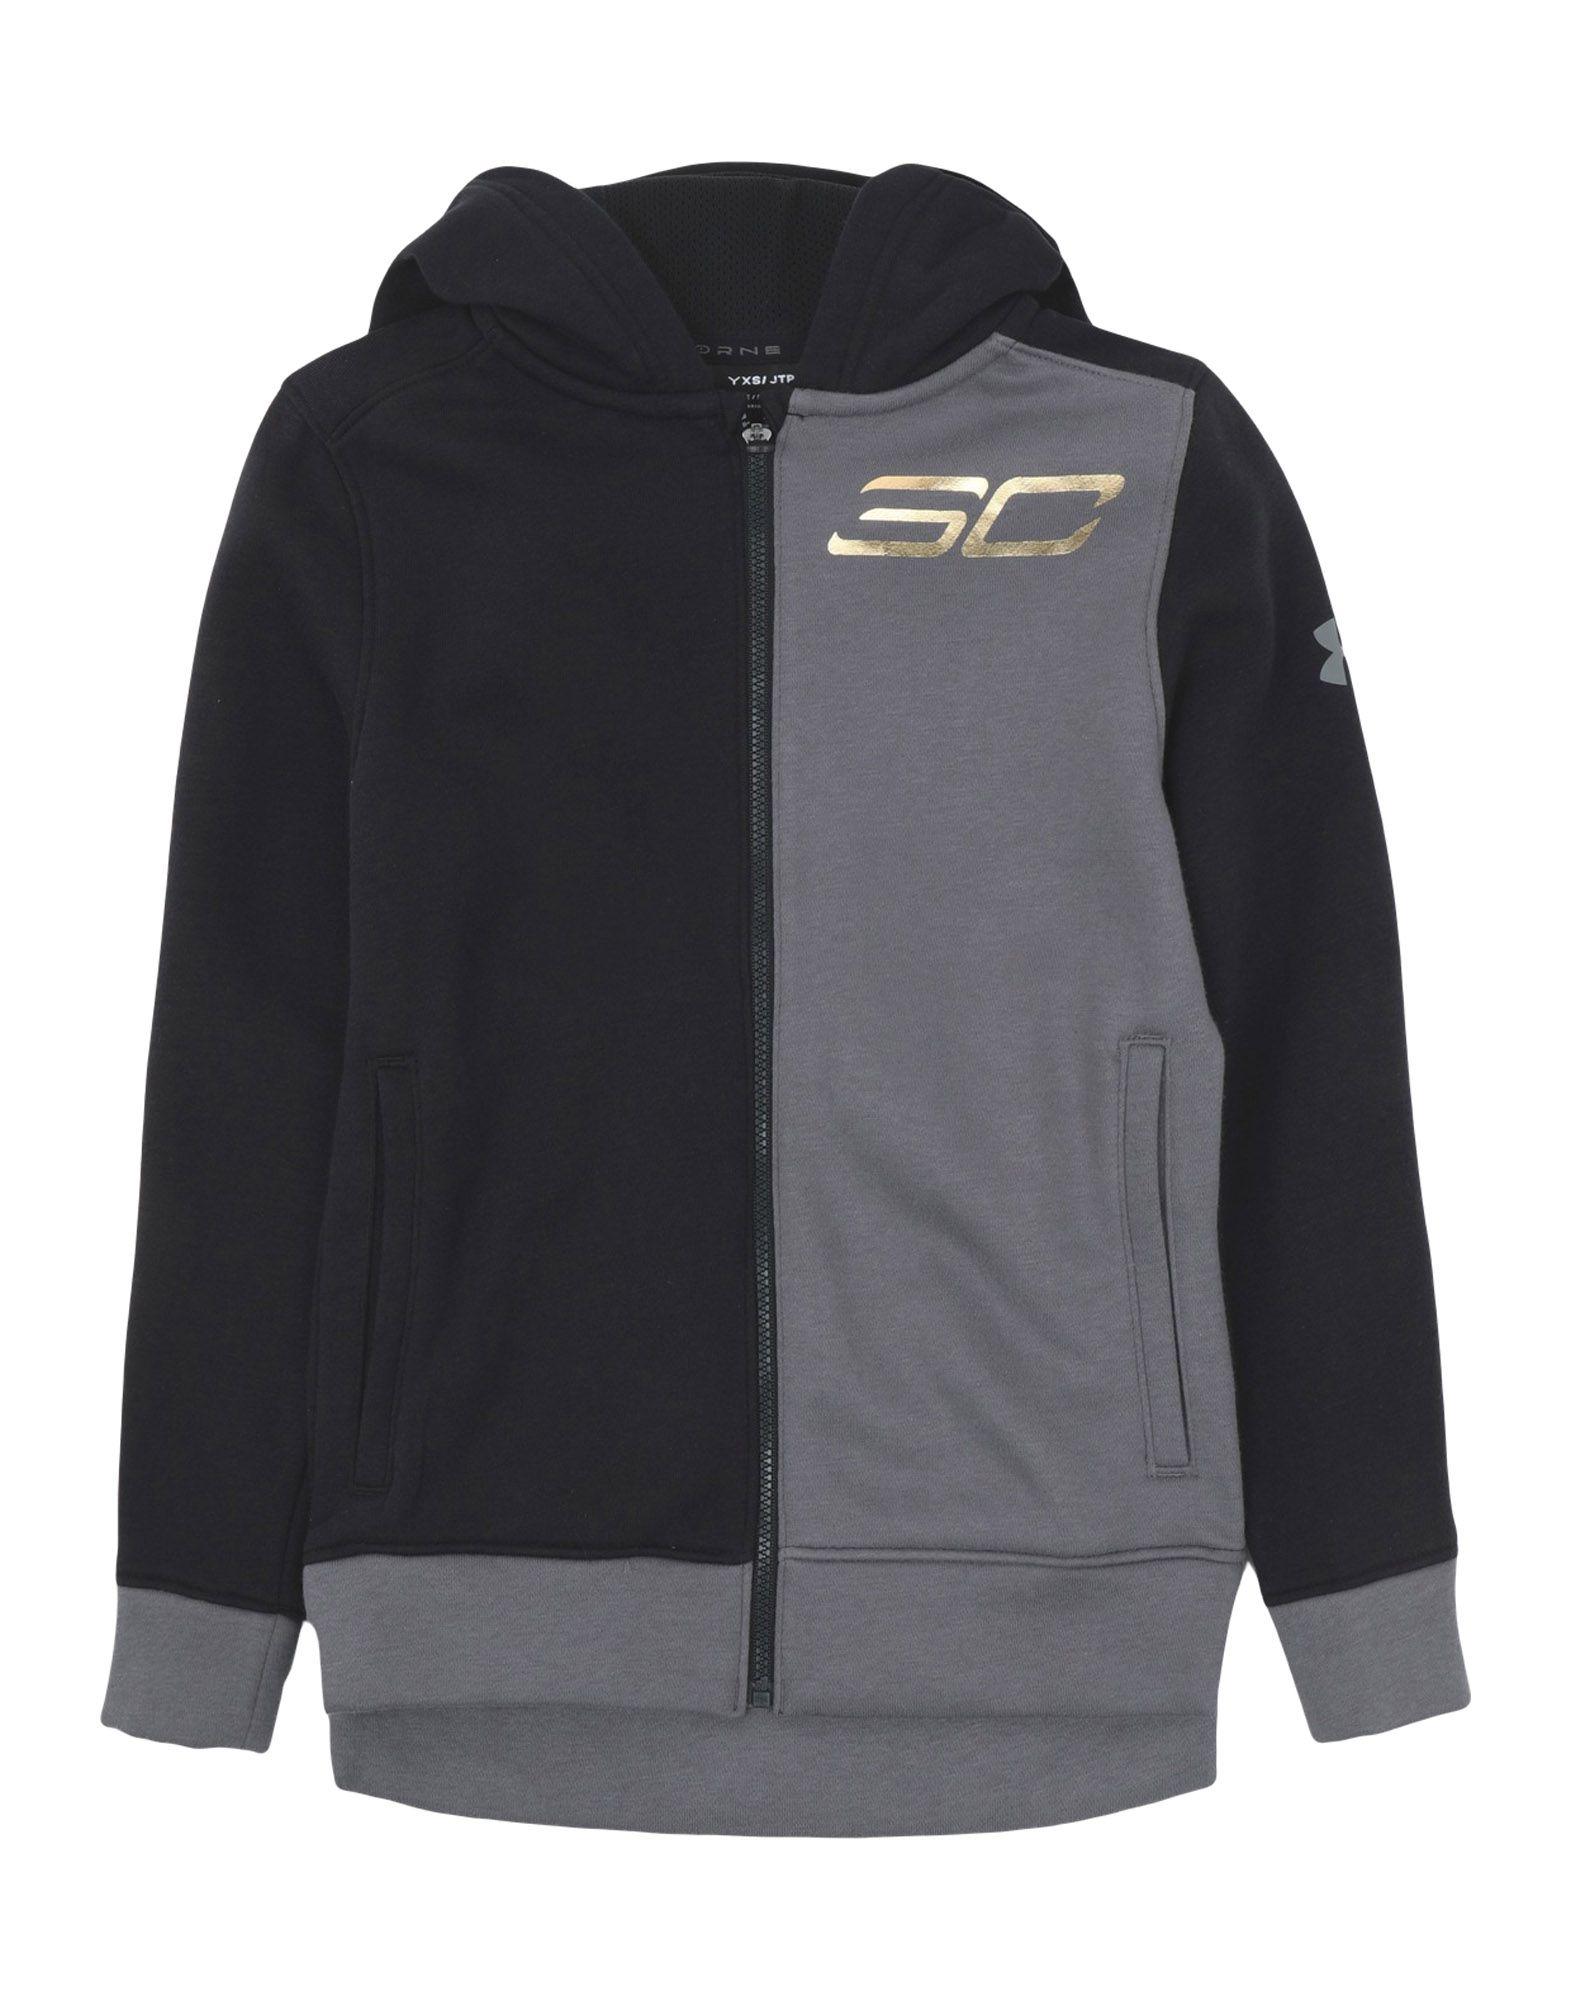 b579d3b8 UNDER ARMOUR Sweatshirt - Jumpers and Sweatshirts | YOOX.COM